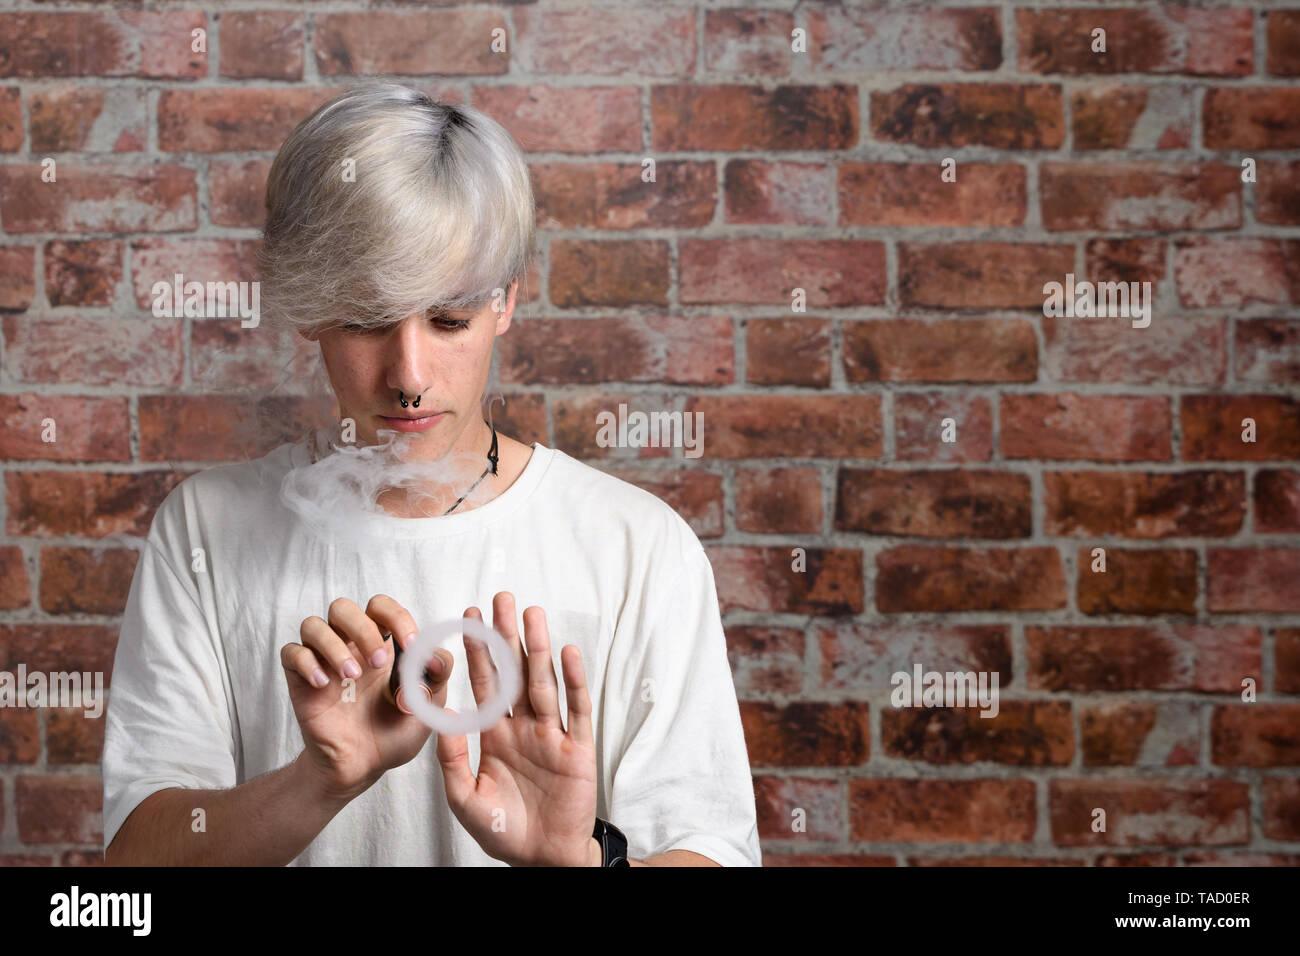 Vaper Smoke outdoor electronic cigarette near the brick wall. Young man smoking big cloud of steam - Stock Image